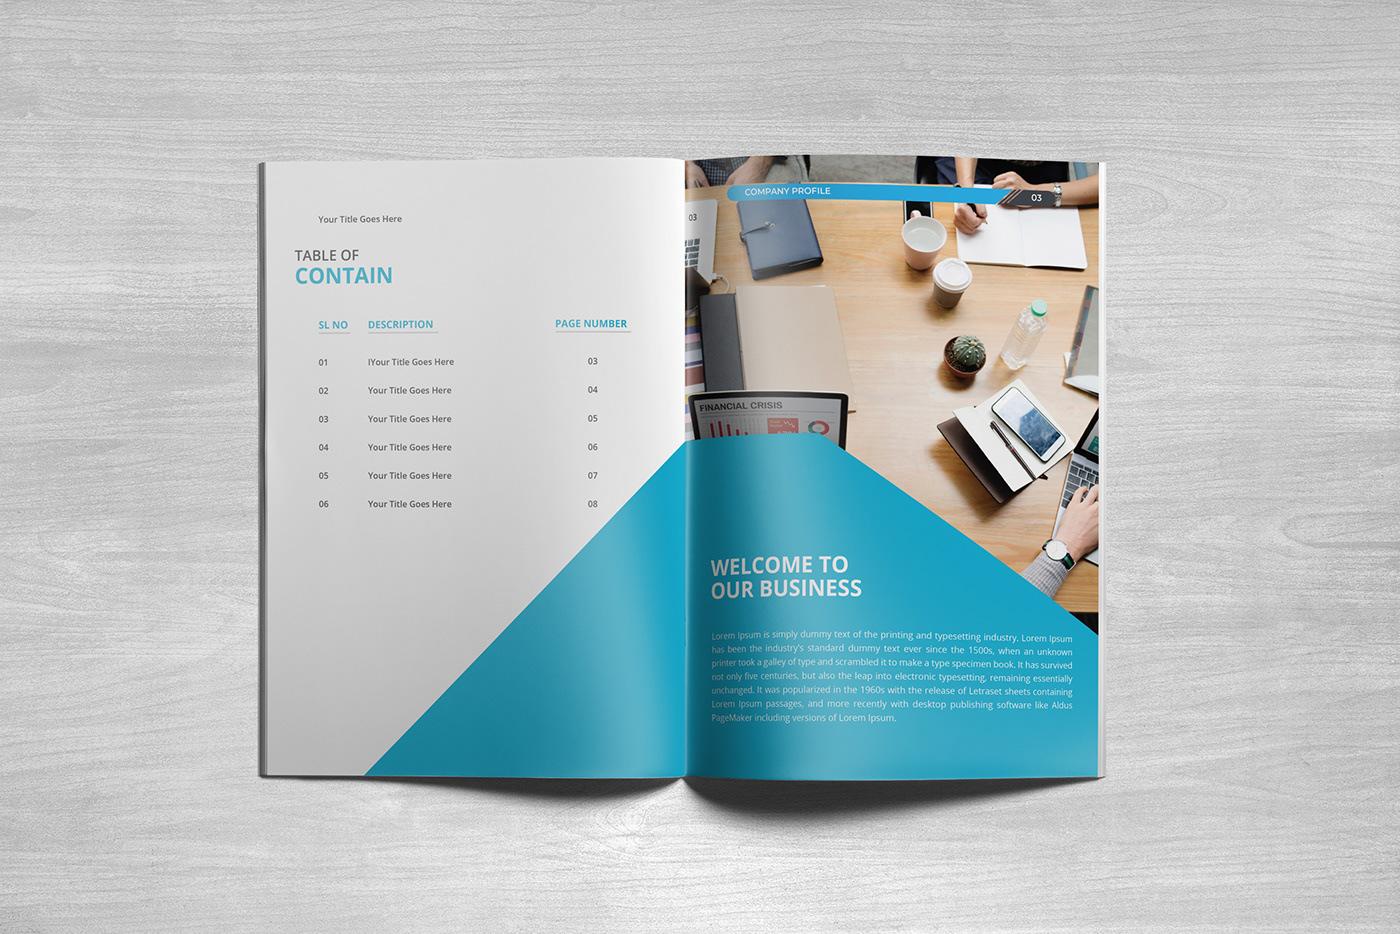 company profile business profile brochure business brochure business Company Brochure business brochure design Company profile design brochure design Business Design